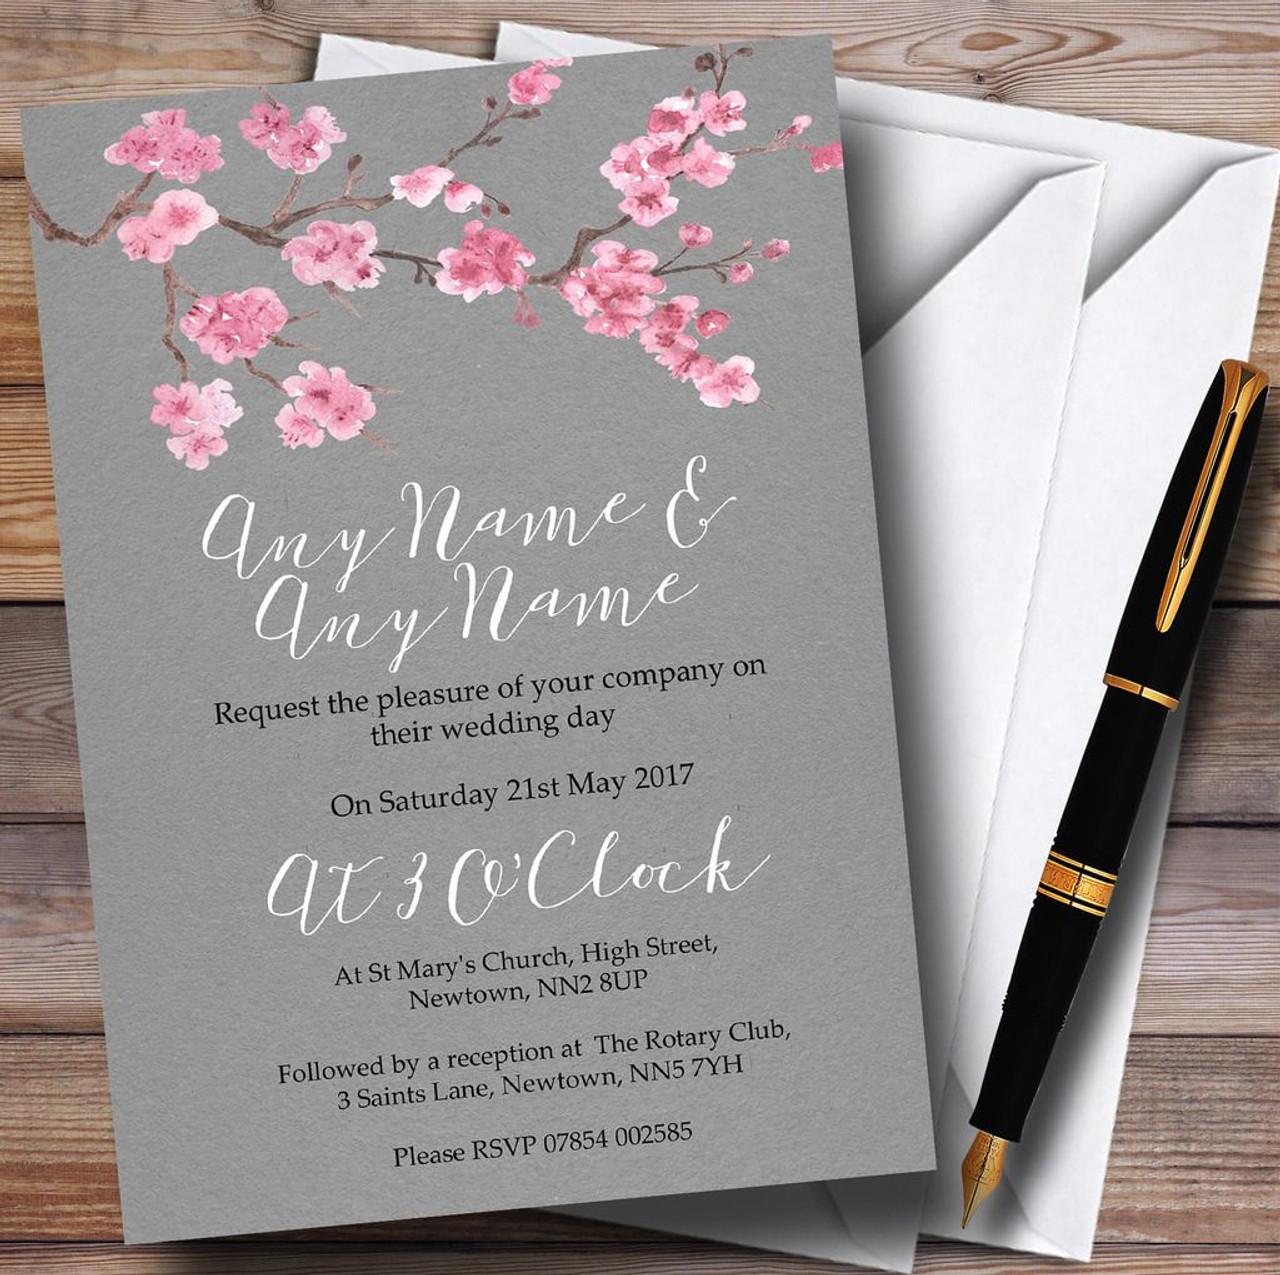 next day wedding invitations%0A Rustic Vintage Dark Grey Pink Blossom Personalised Wedding